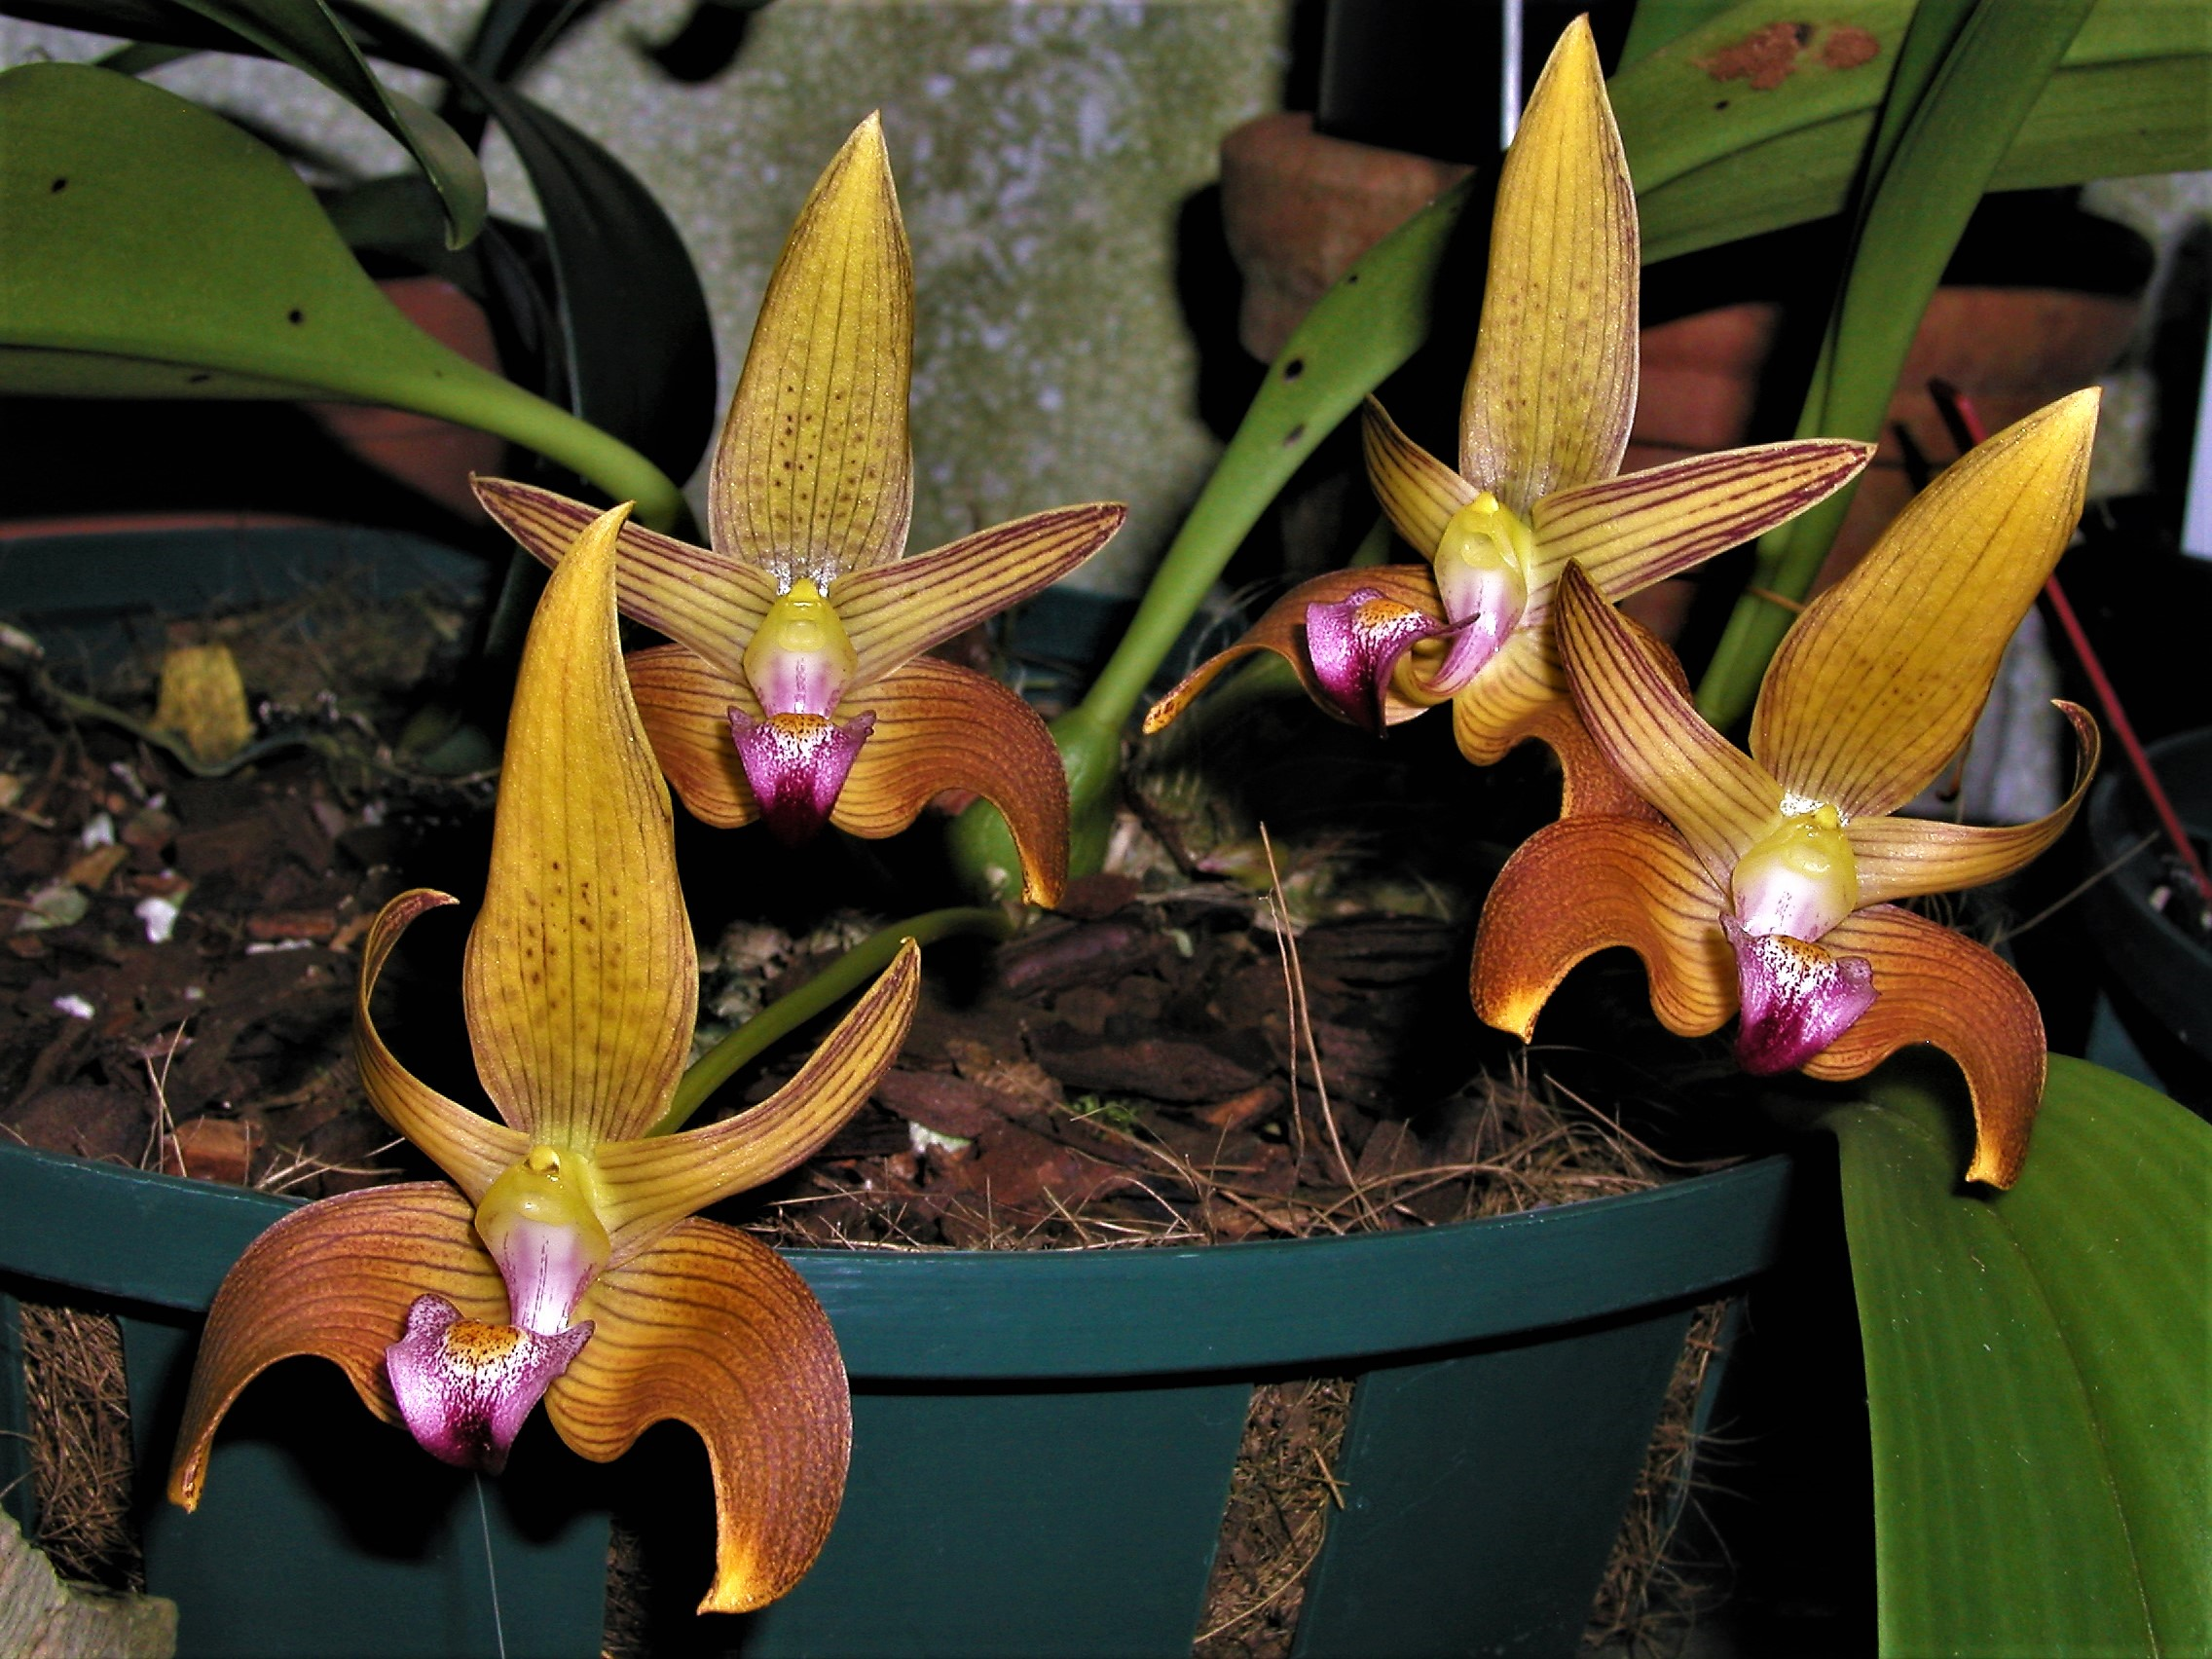 Bulbophyllum_lobbii_syn _B claptonense (4).jpg